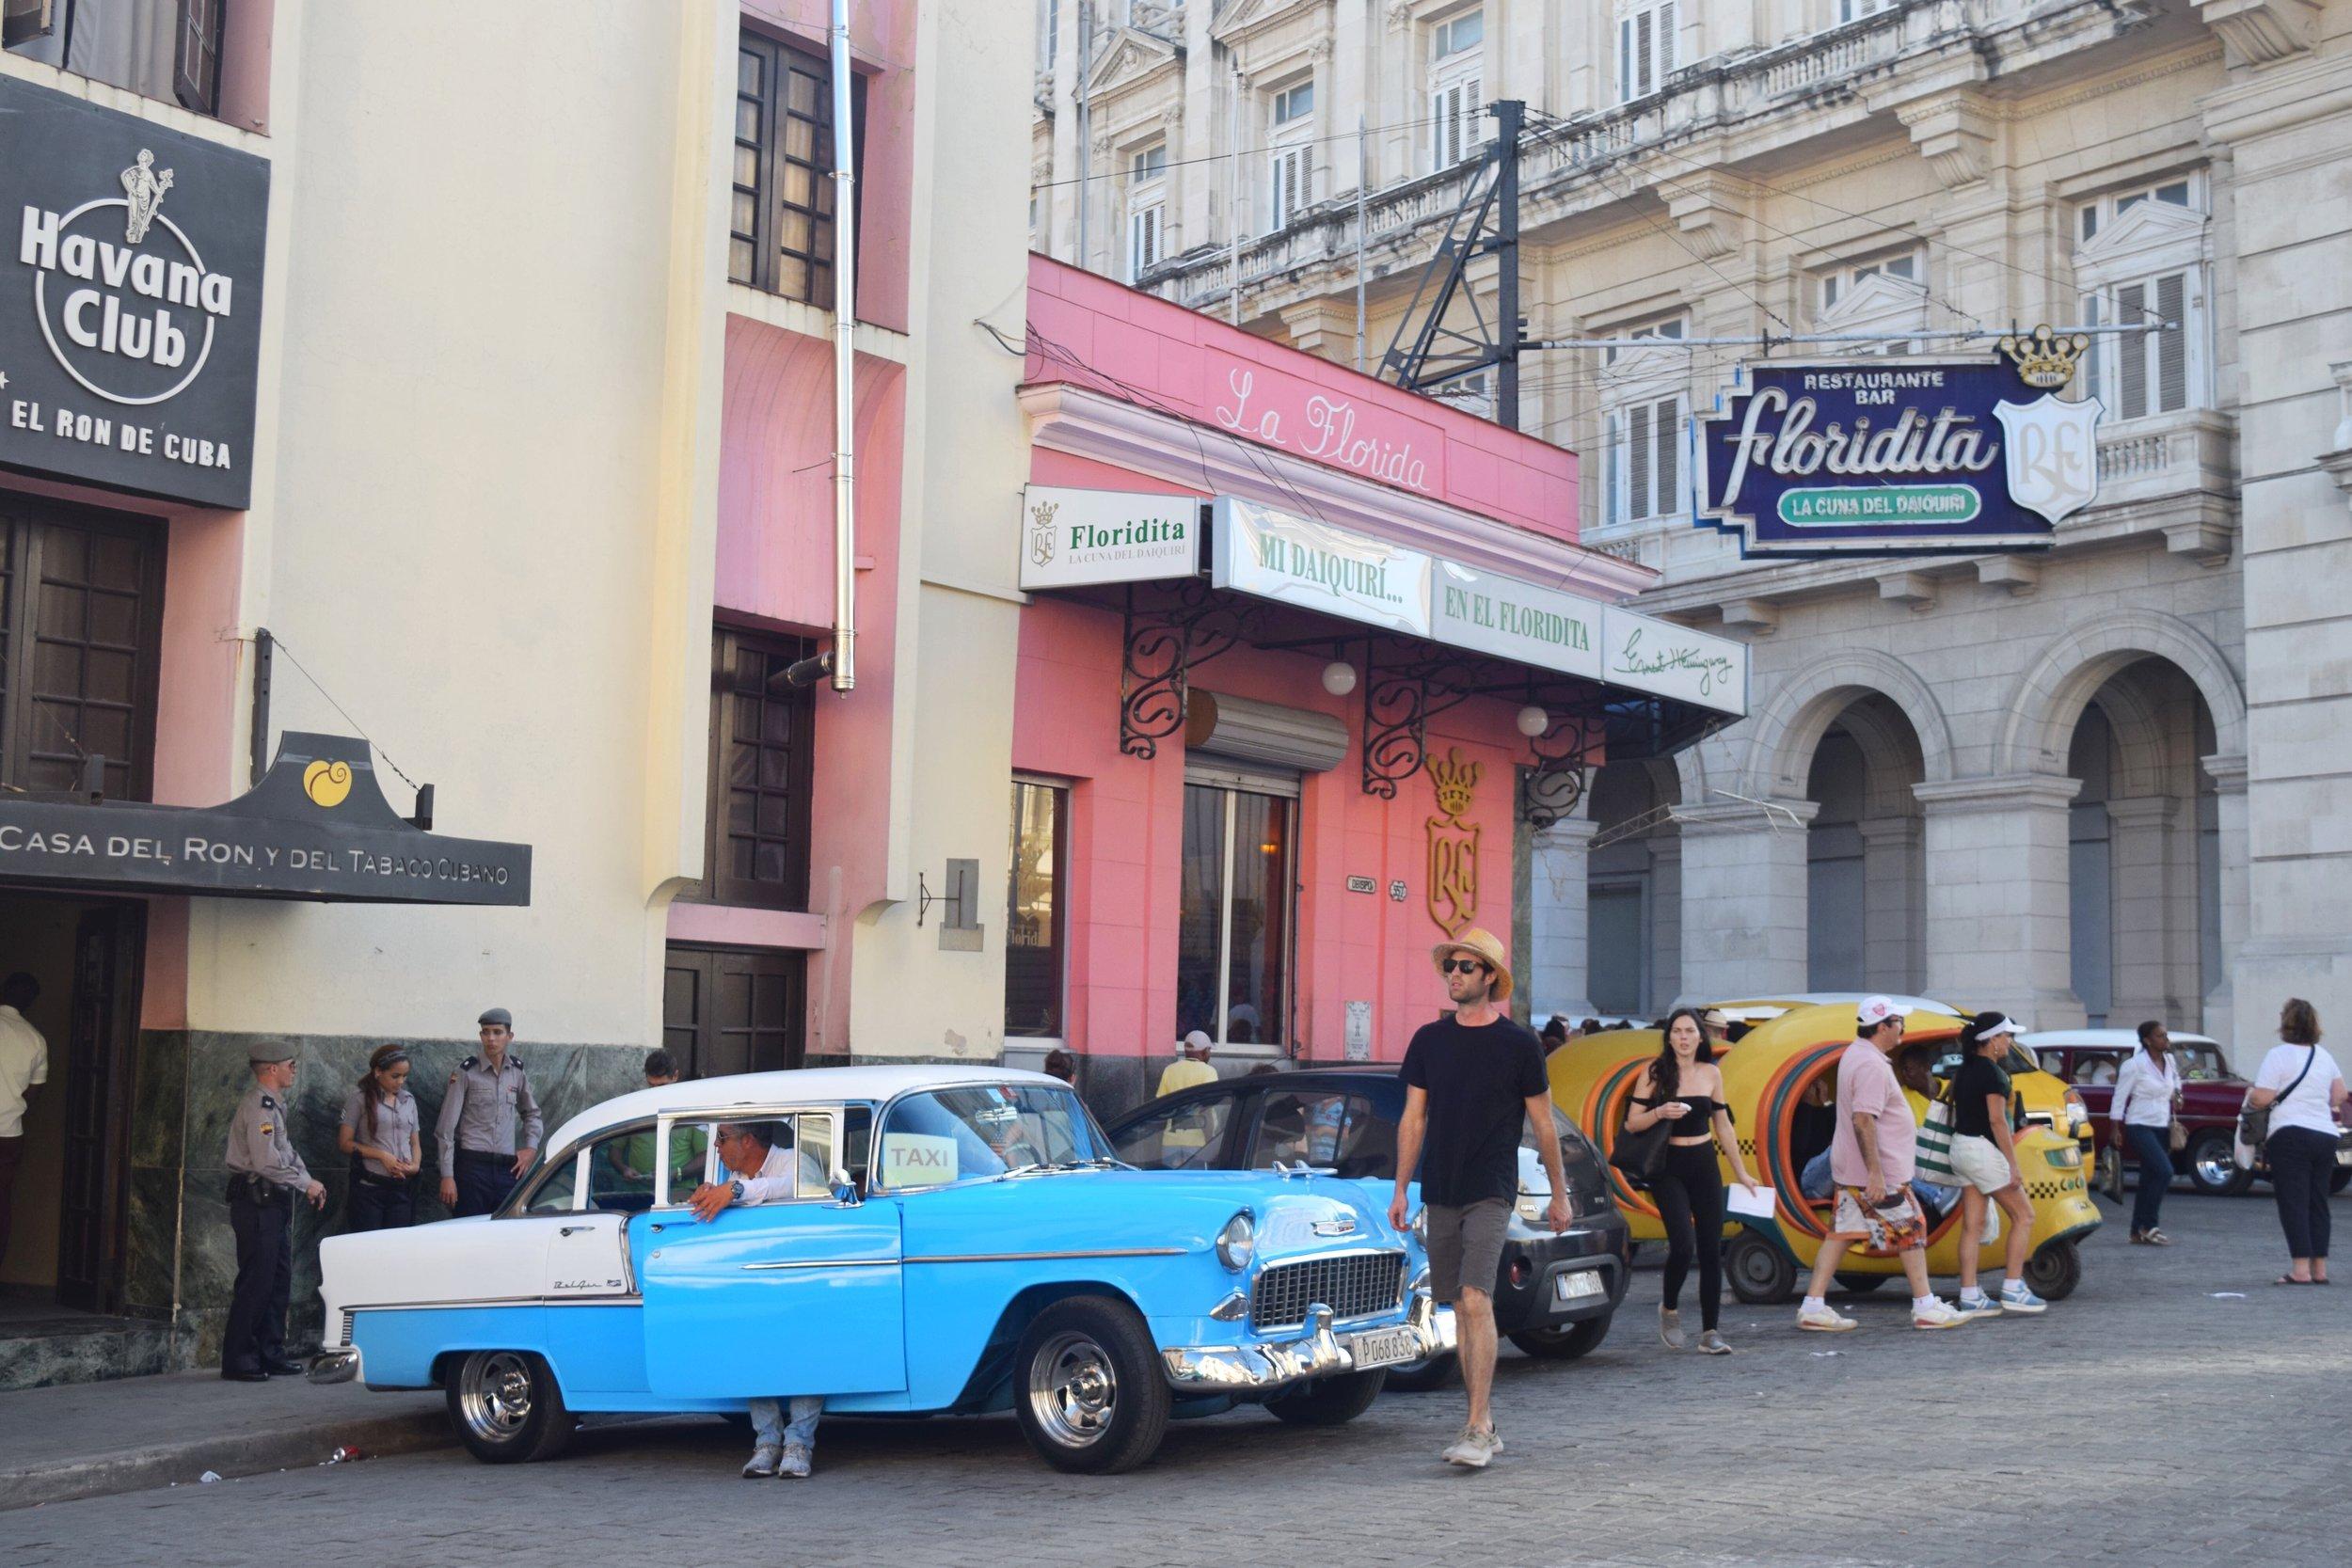 One of the best places to eat in Havana Cuba. La Floridita home to the original daiquiri and a favorite of hemingway! -  Tessa Juliette | http://travelwheretonext.com/cuba